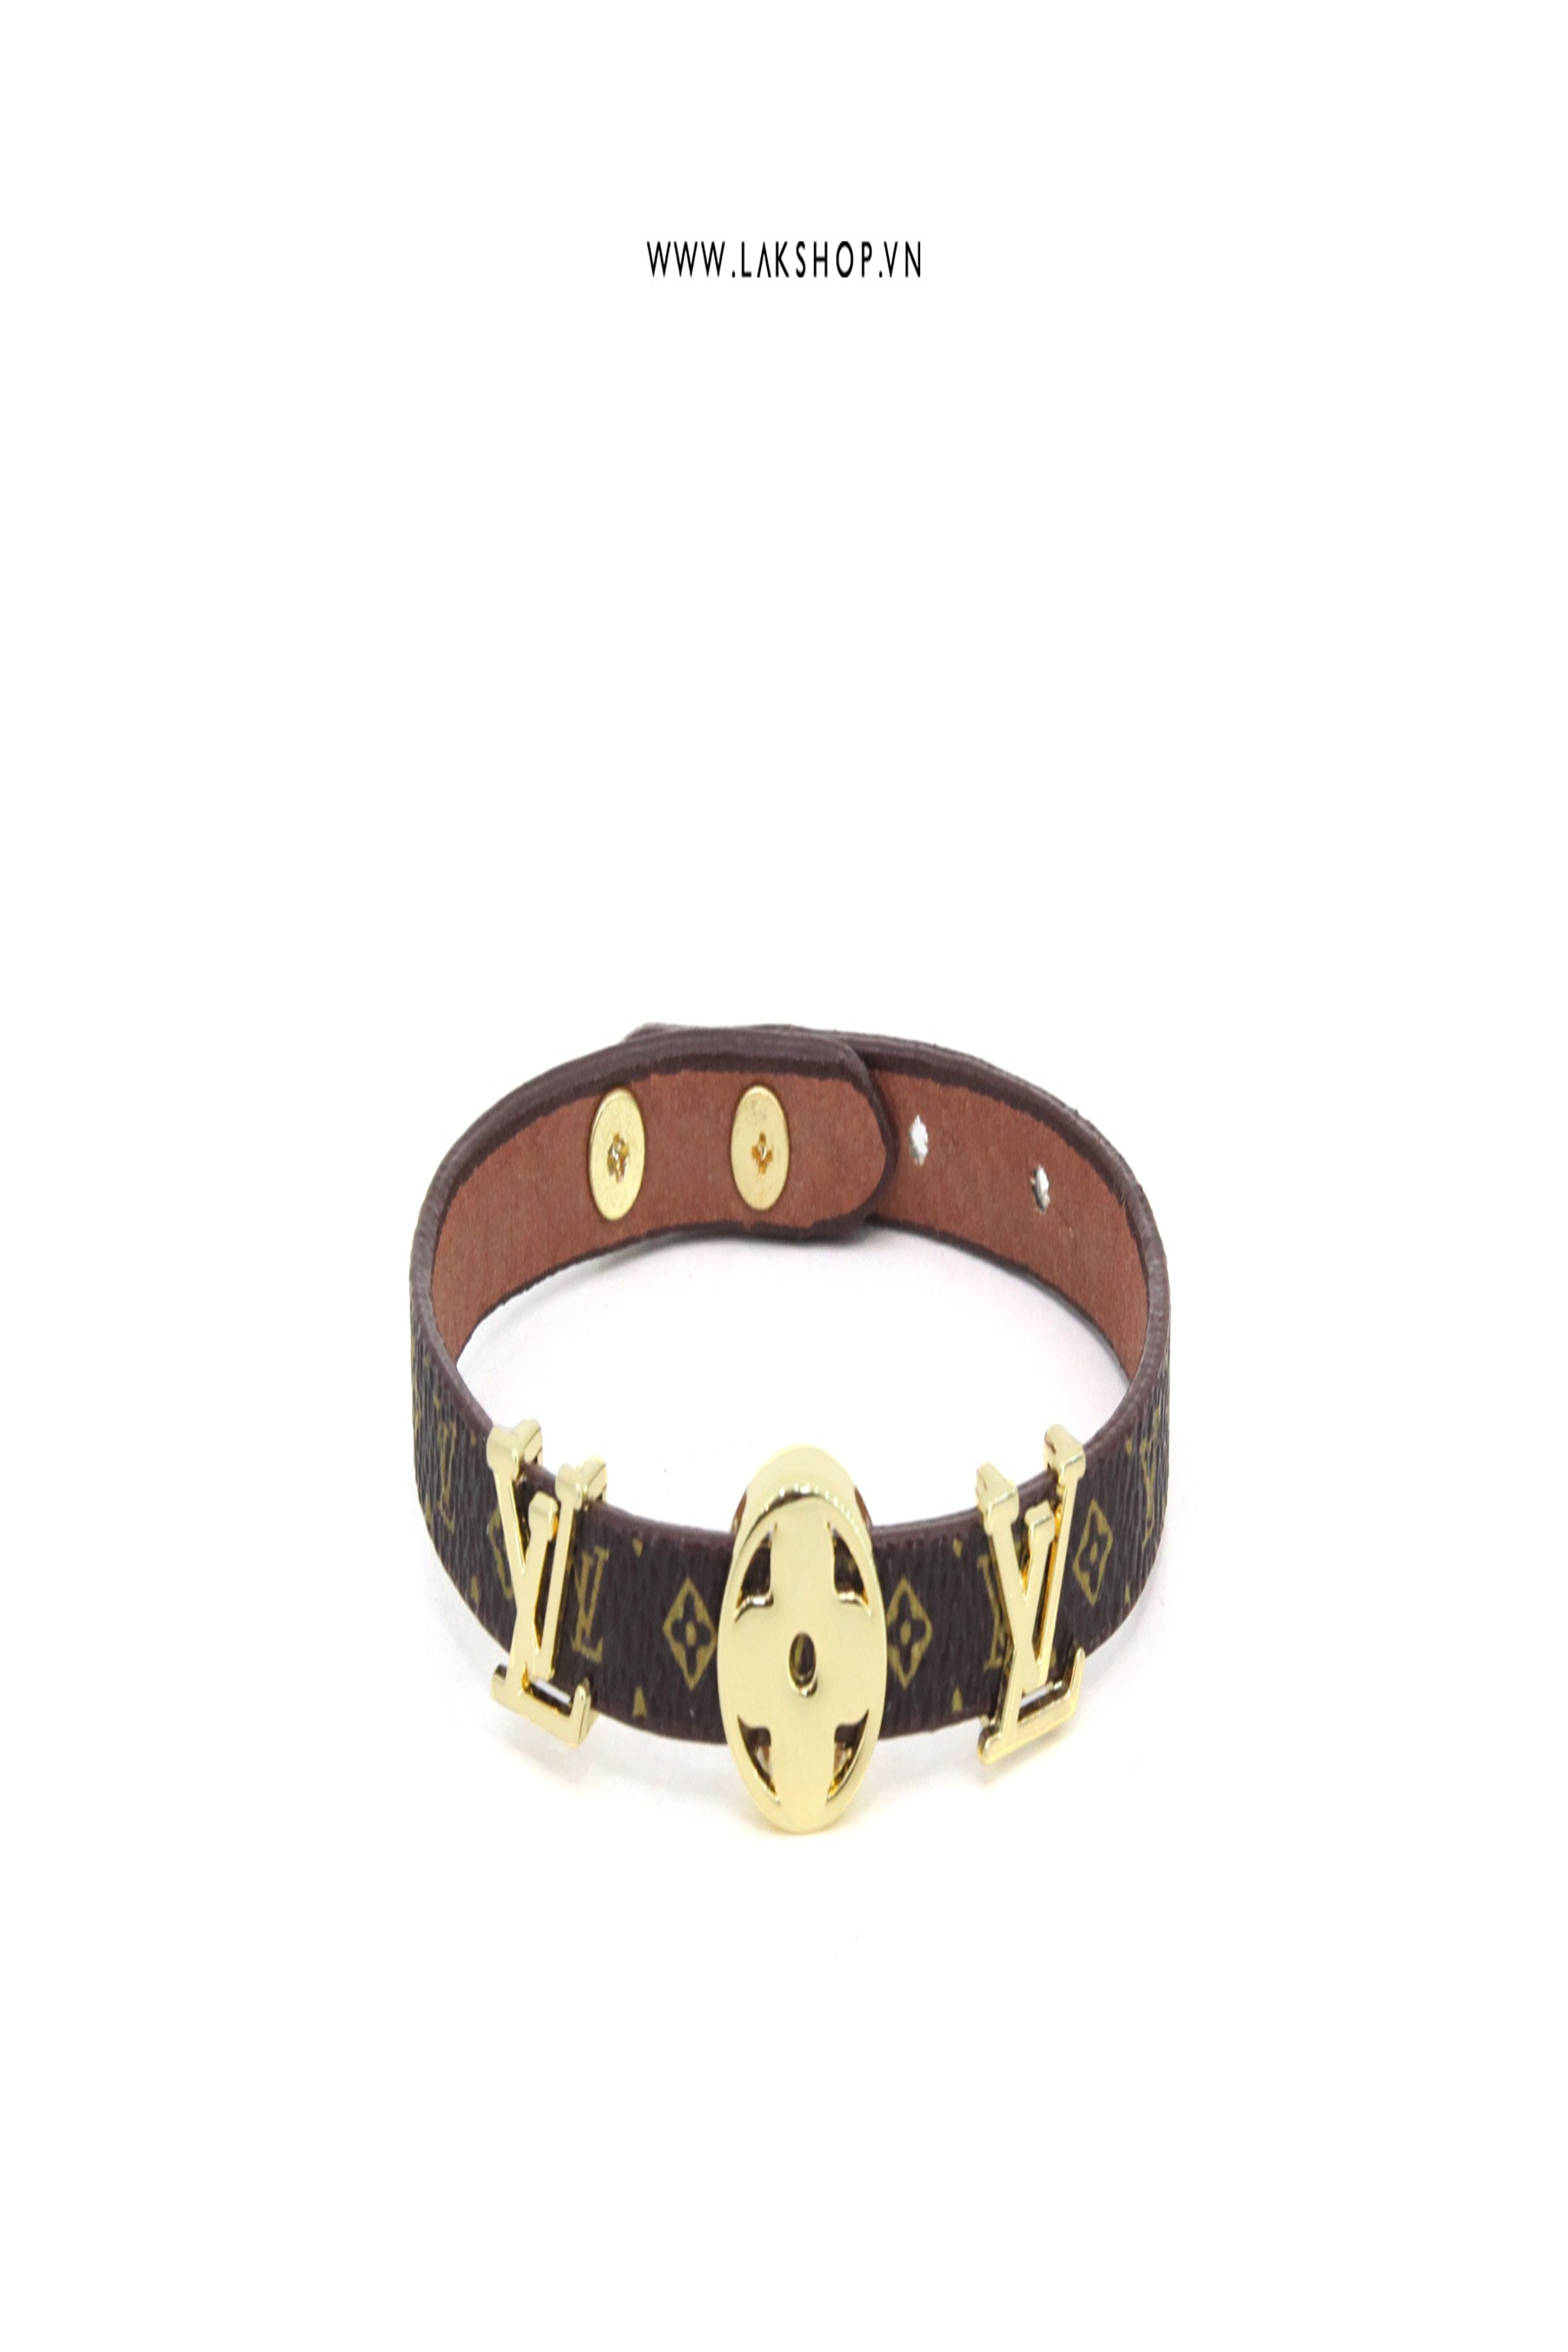 Gucci GG Sylvie Velvet /Leather Shoulder Bag (LikeAuth)